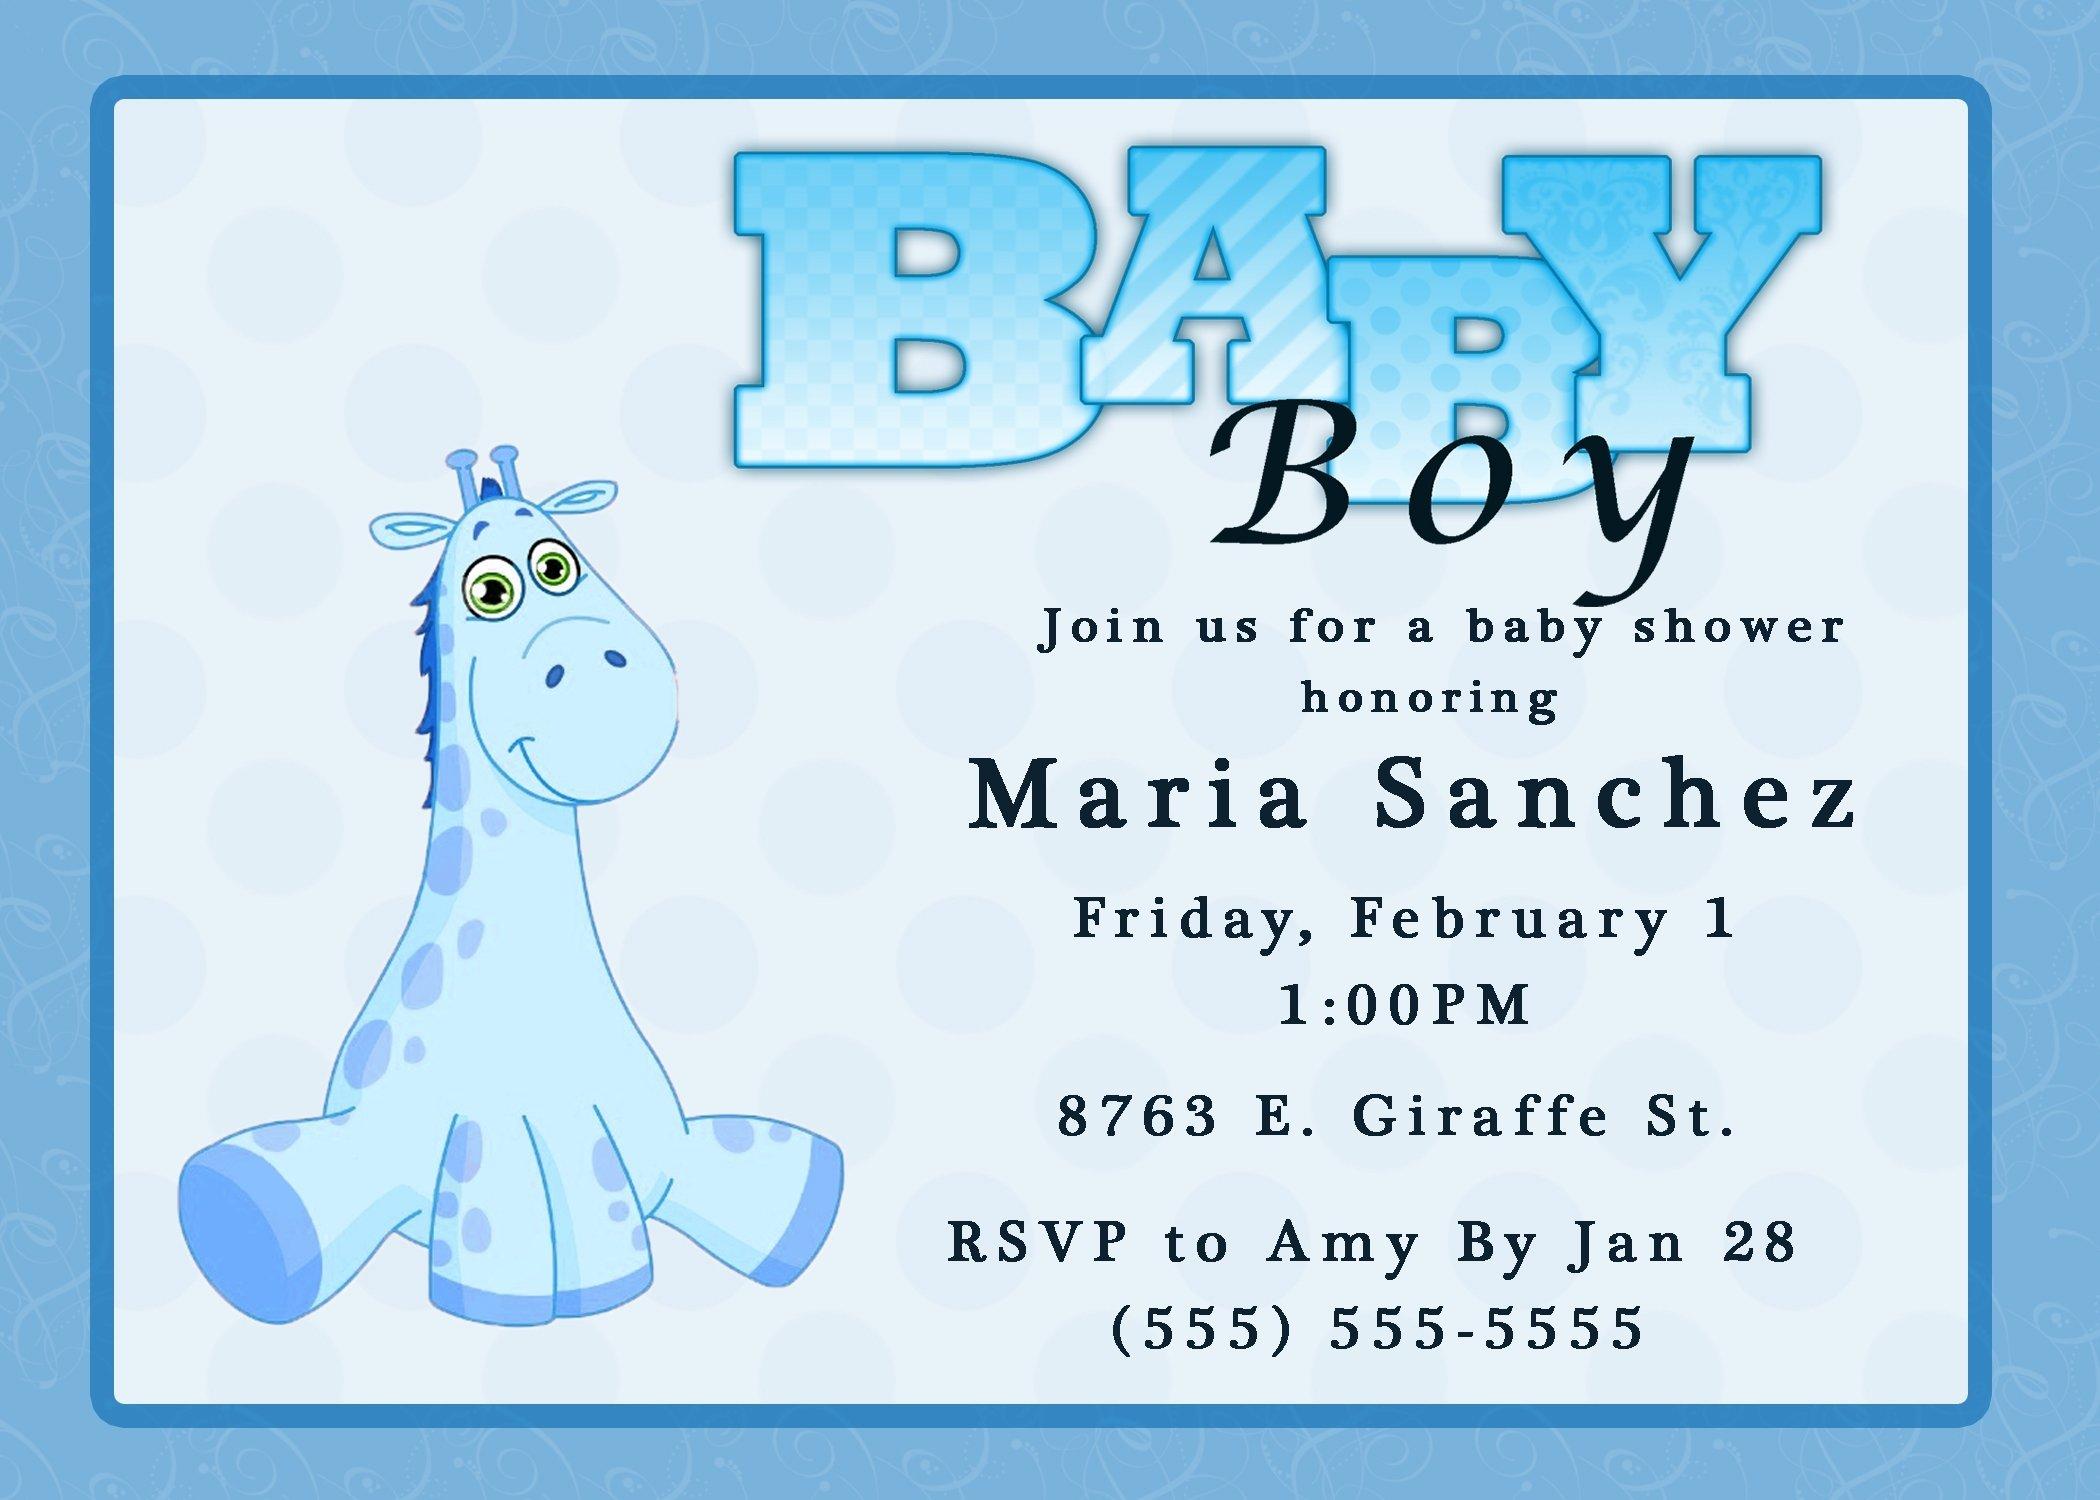 10 Lovable Boy Baby Shower Invitations Wording Ideas baby boy shower invitation wording ideas on baby shower invitations 2021